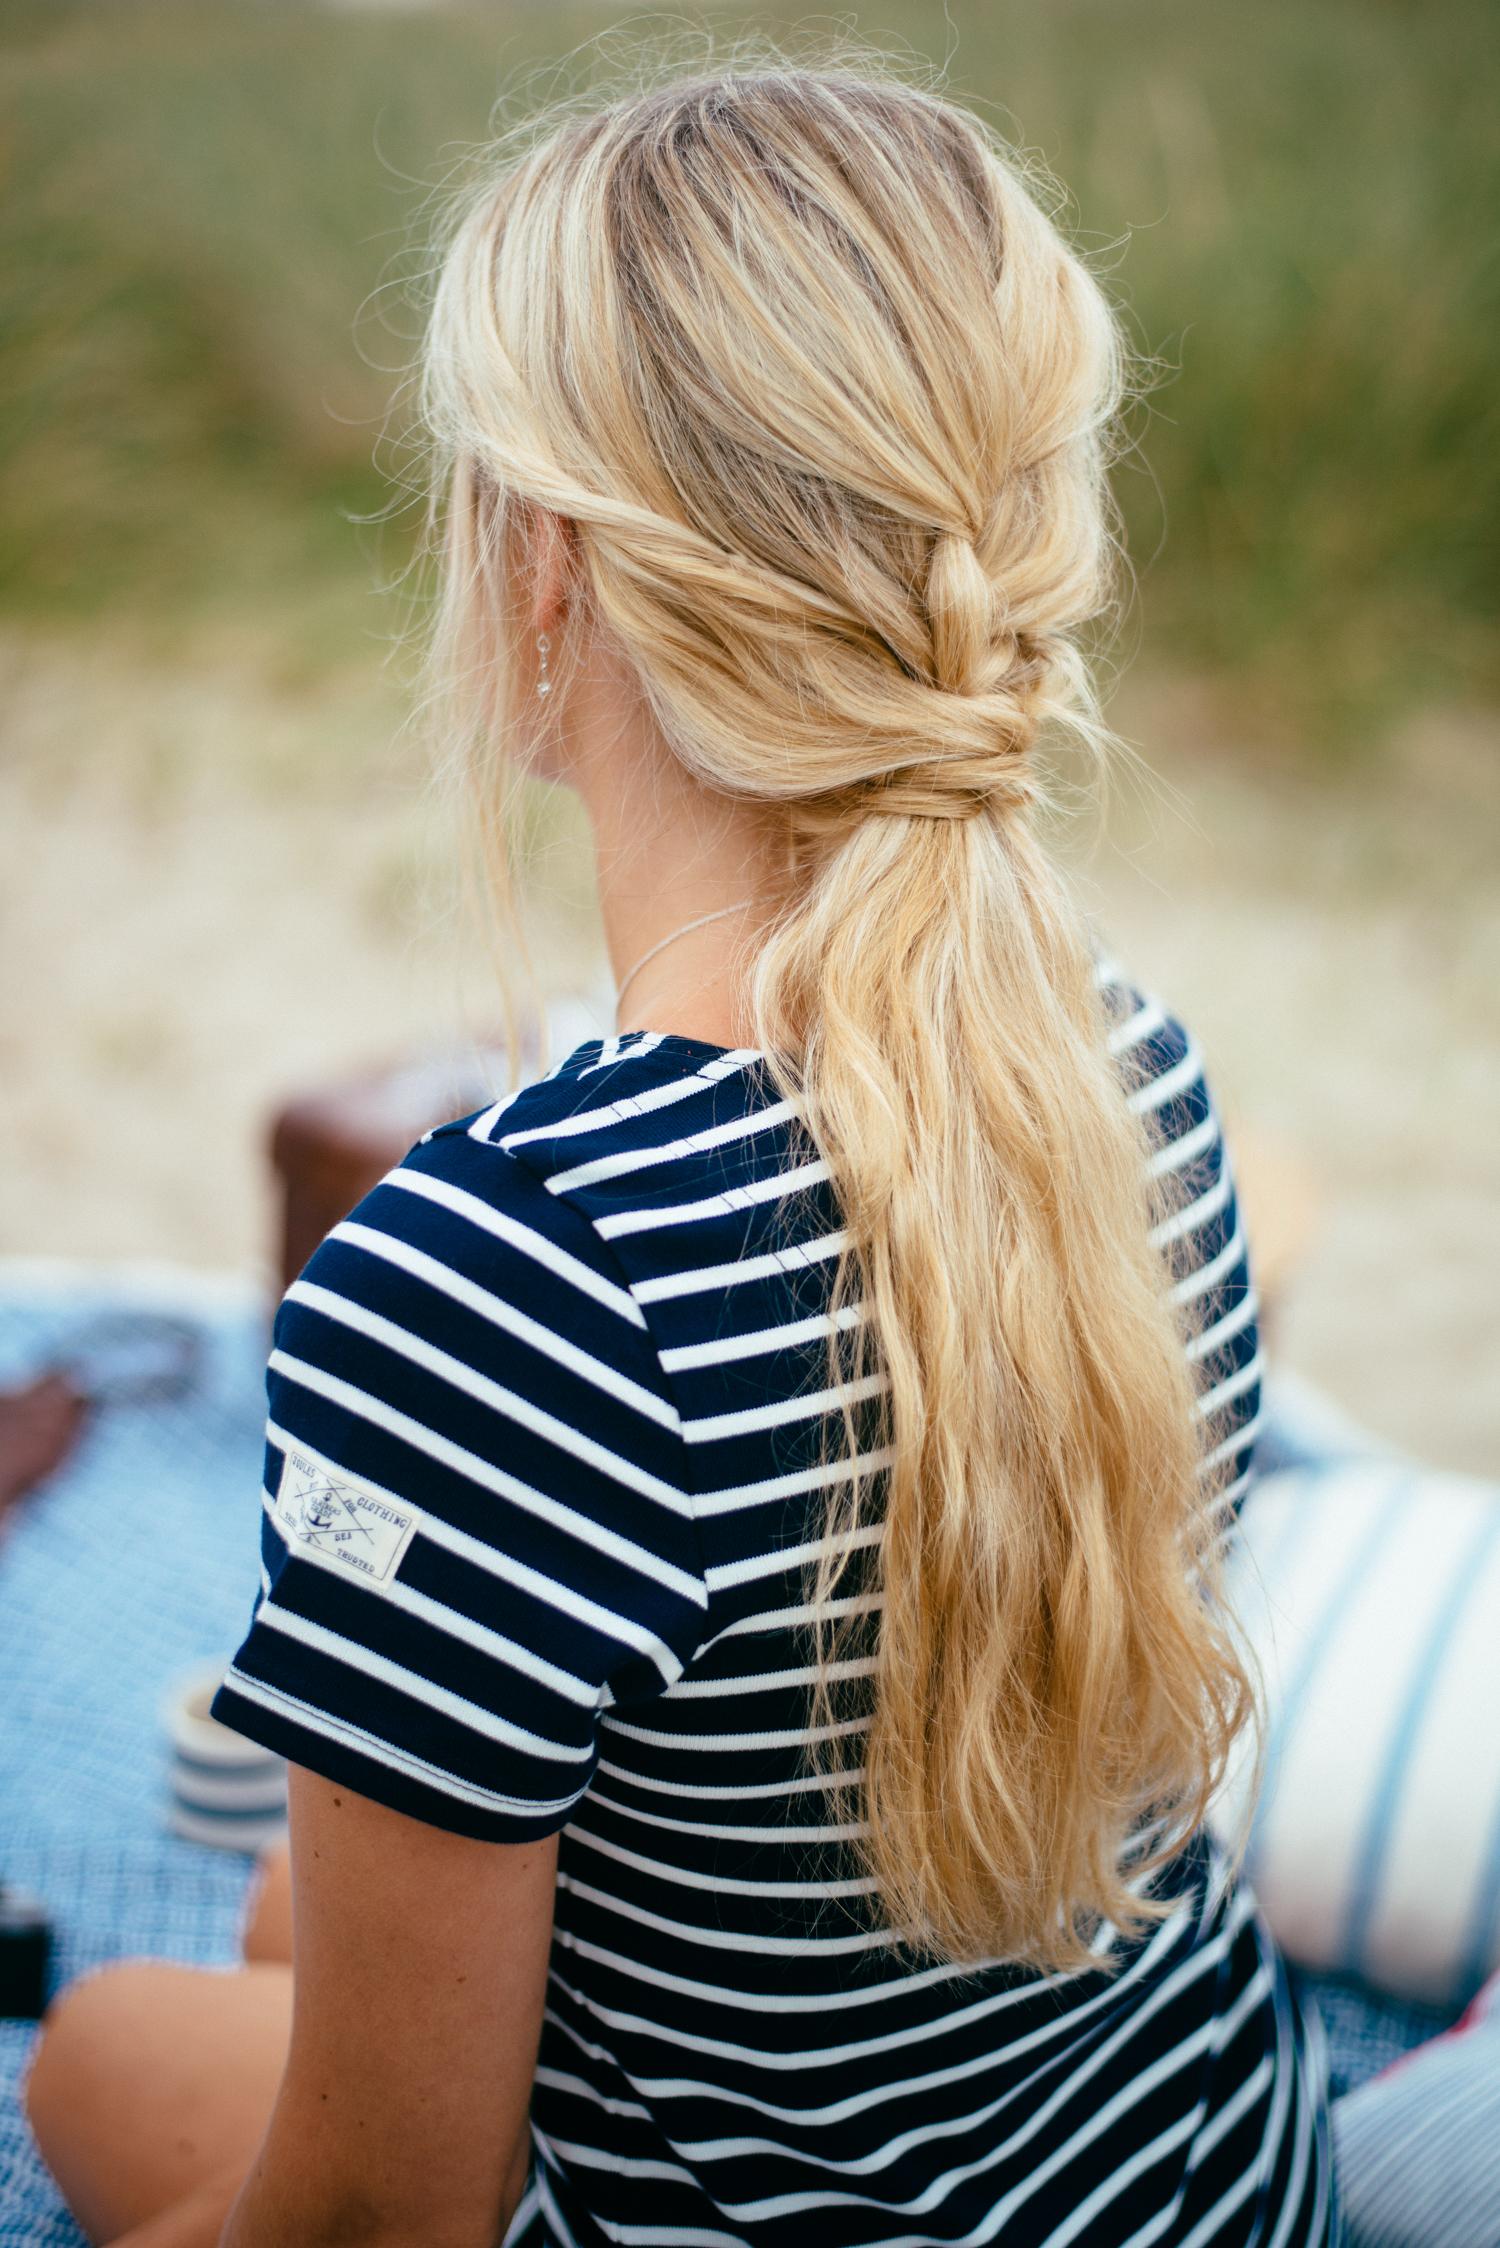 joules hair